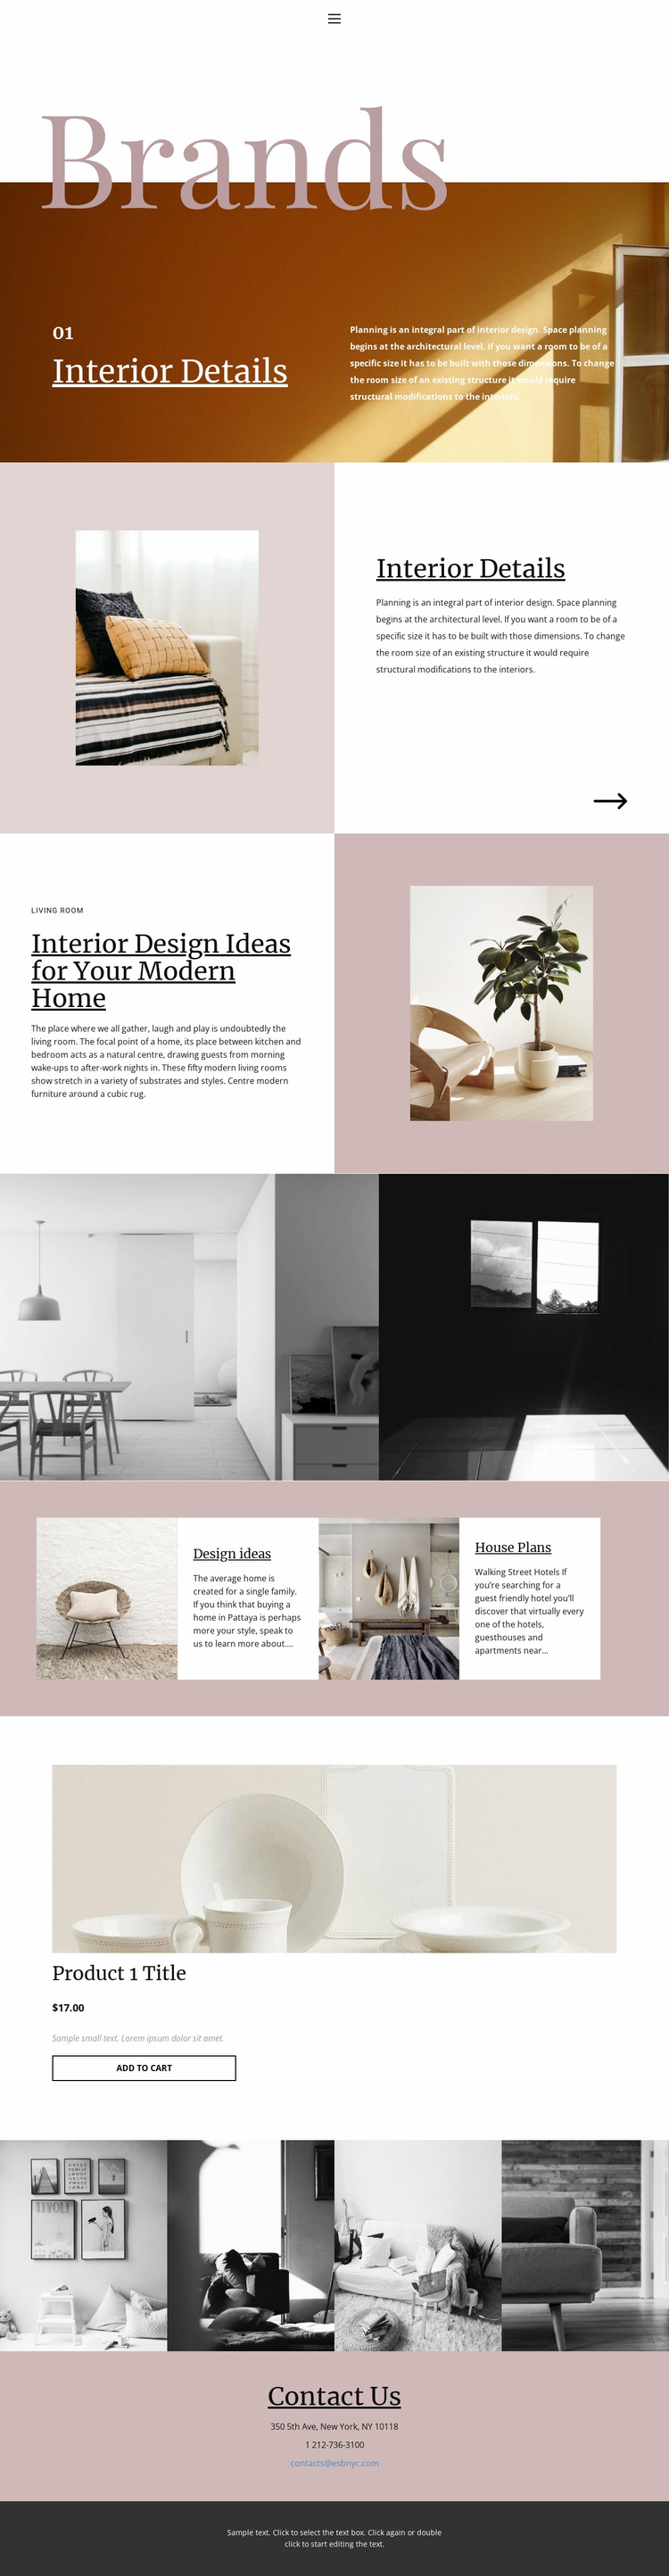 I am an interior designer Landing Page